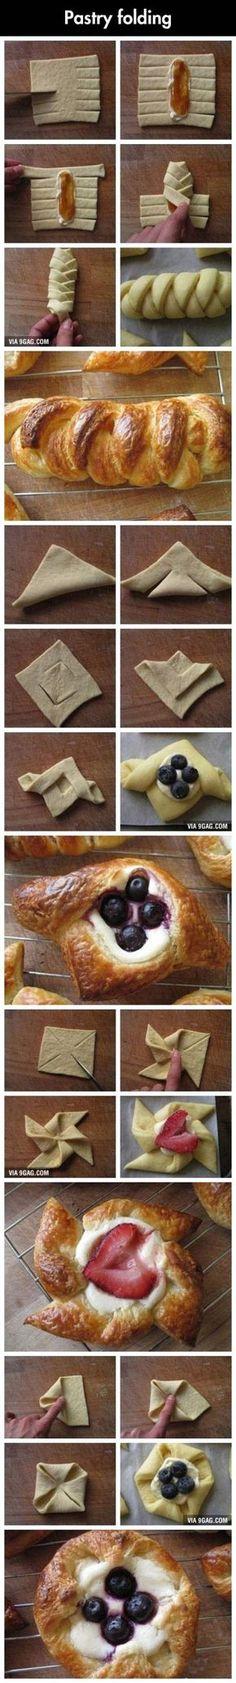 Awesome Dessert Designs